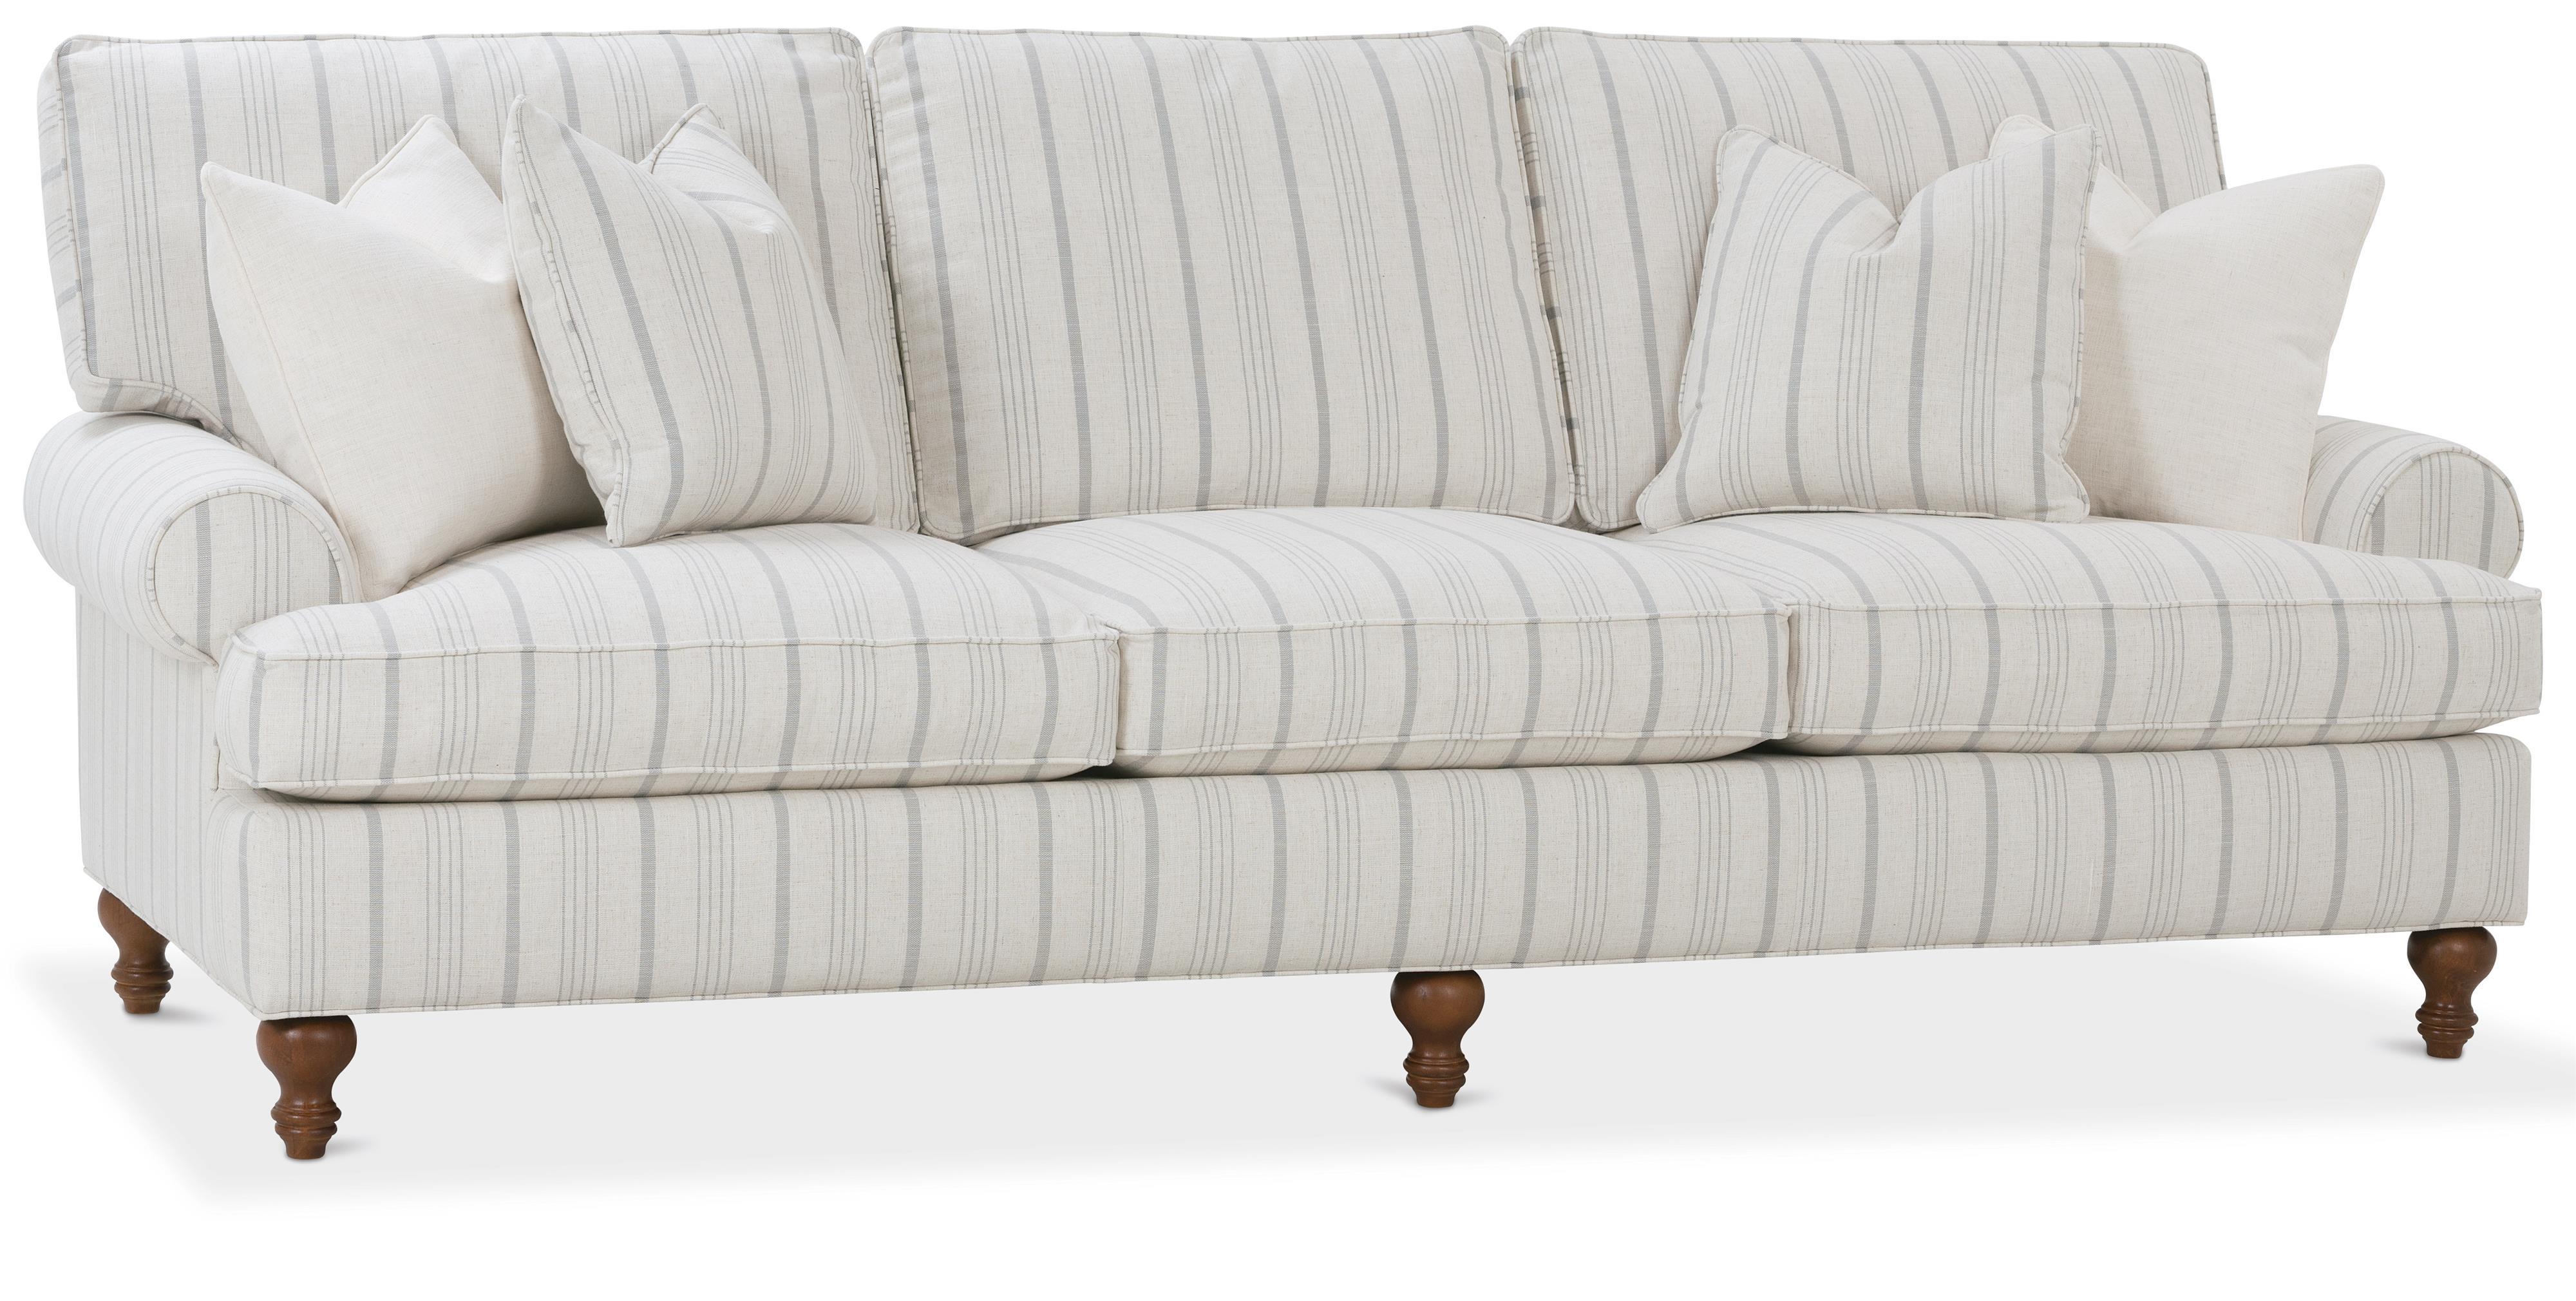 Traditional Three Seat Sofa